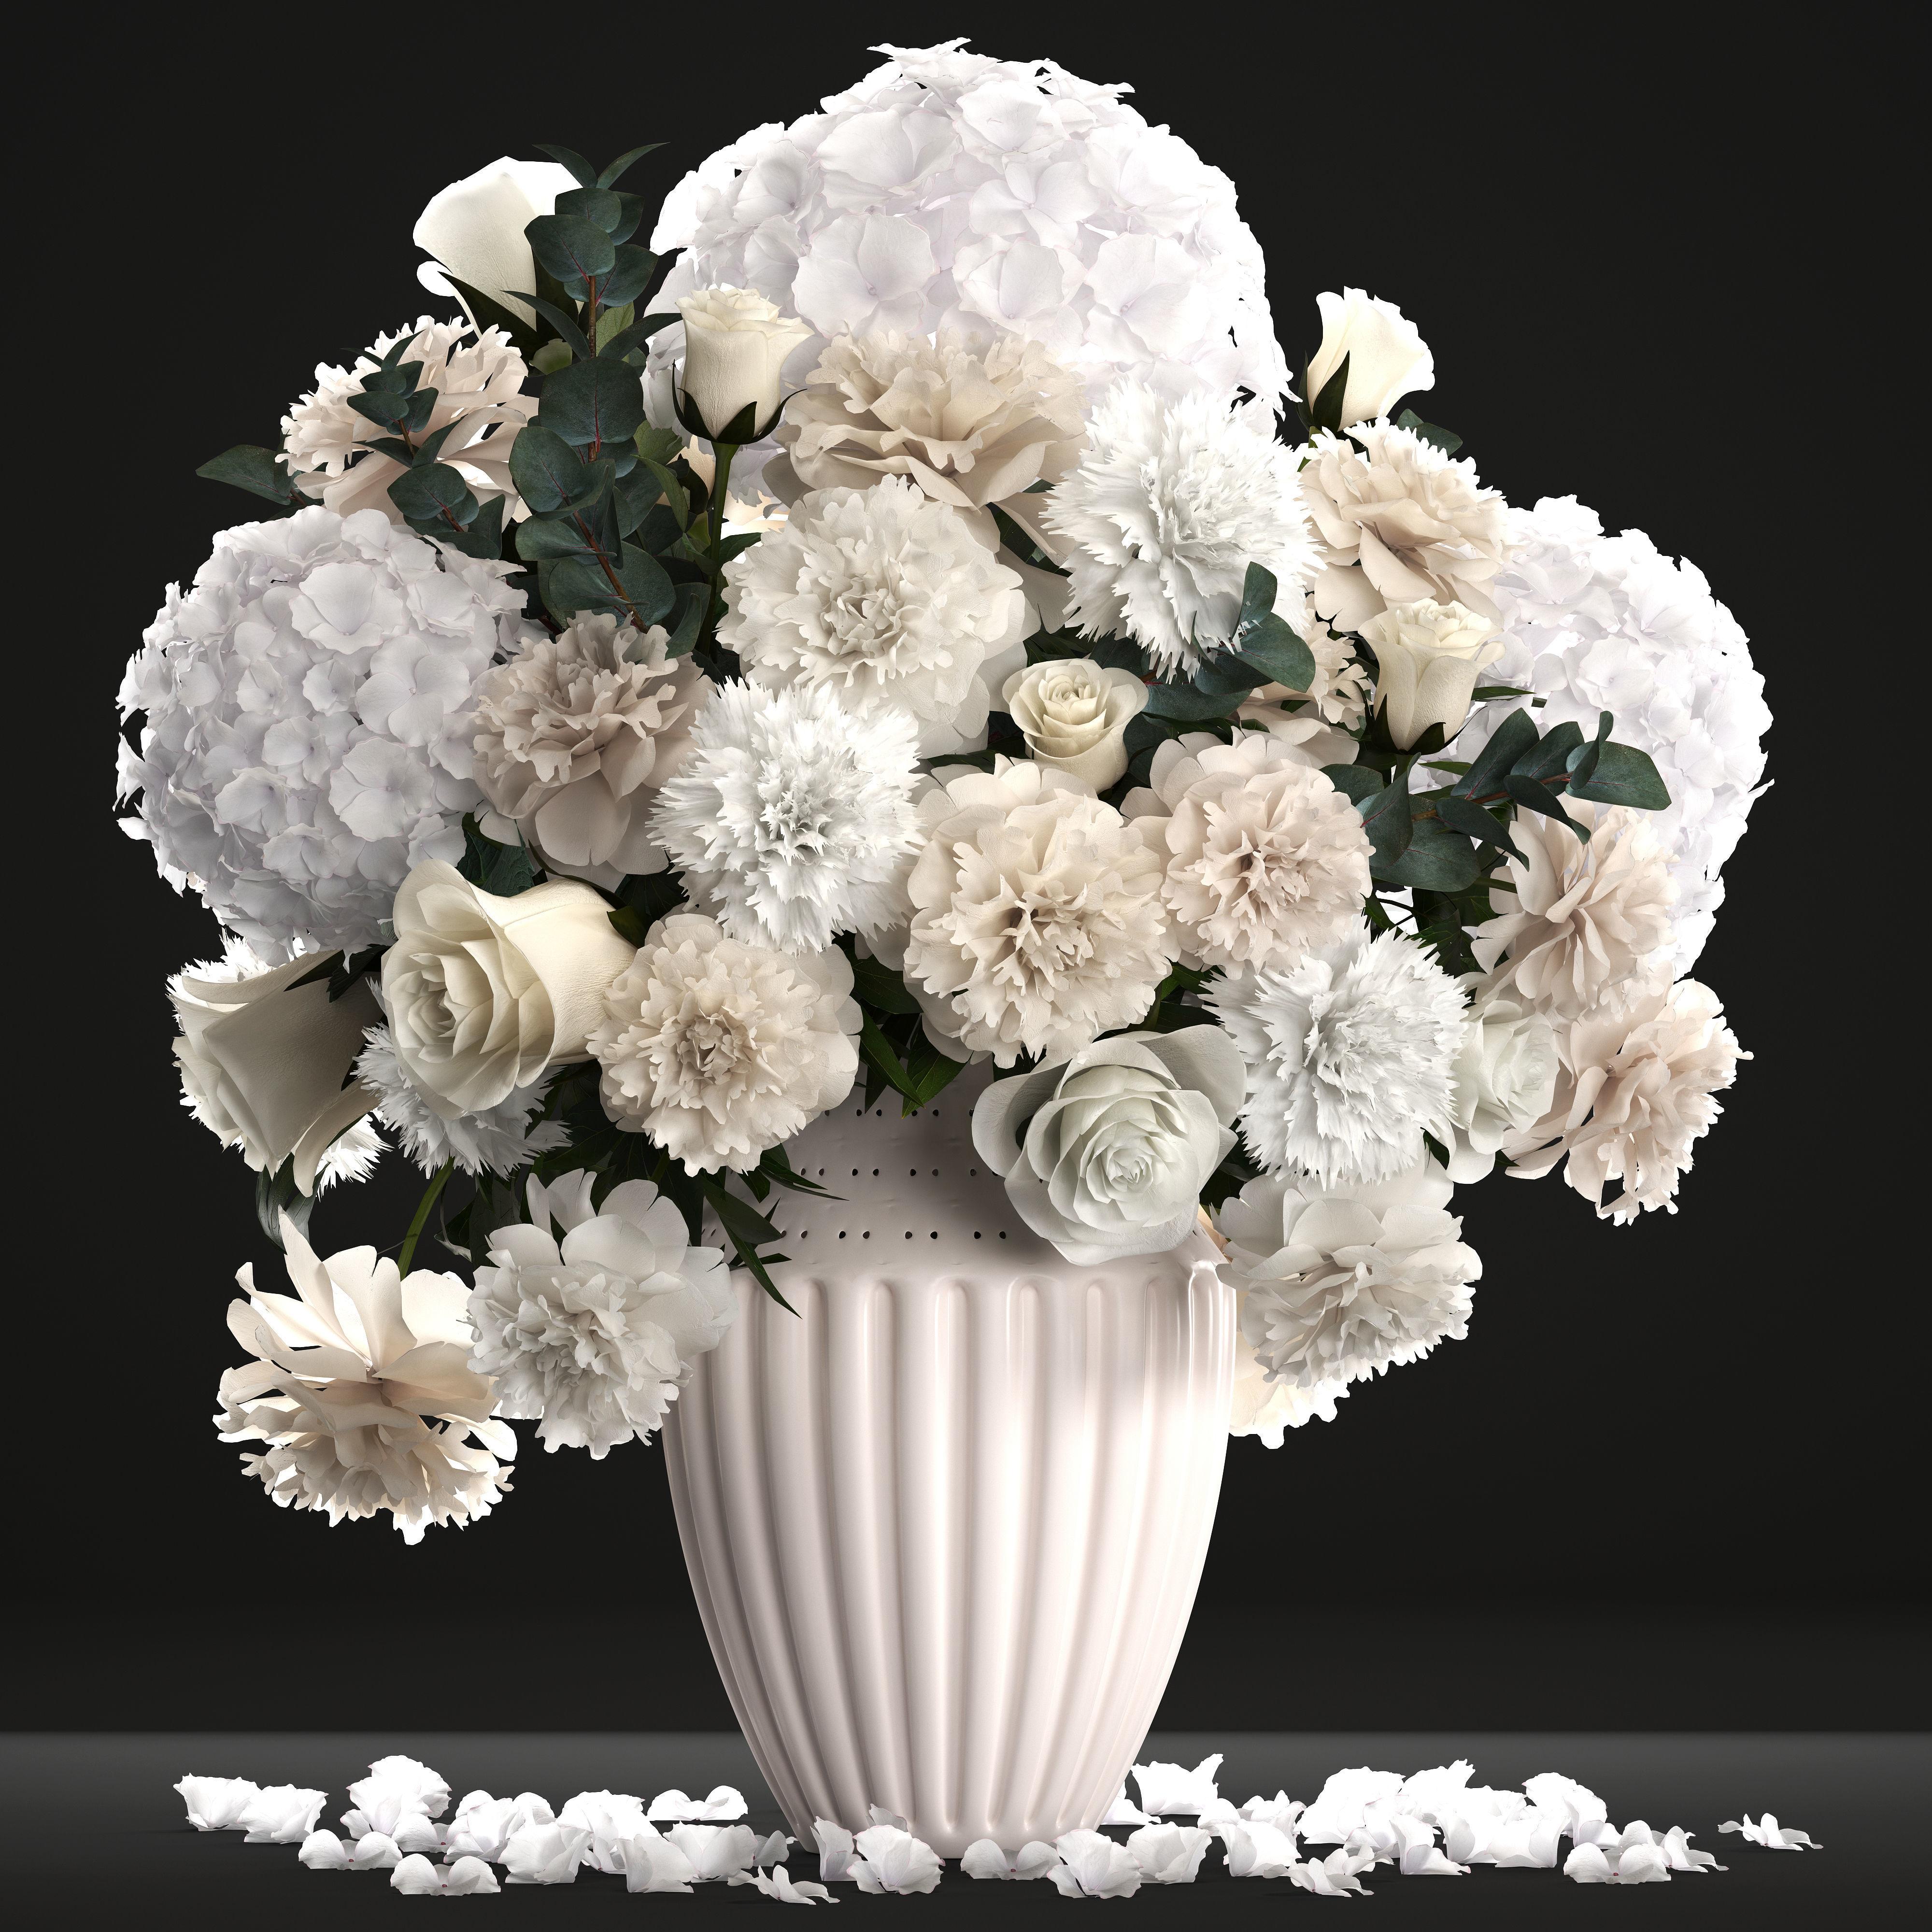 Bouquet of wthite flowers